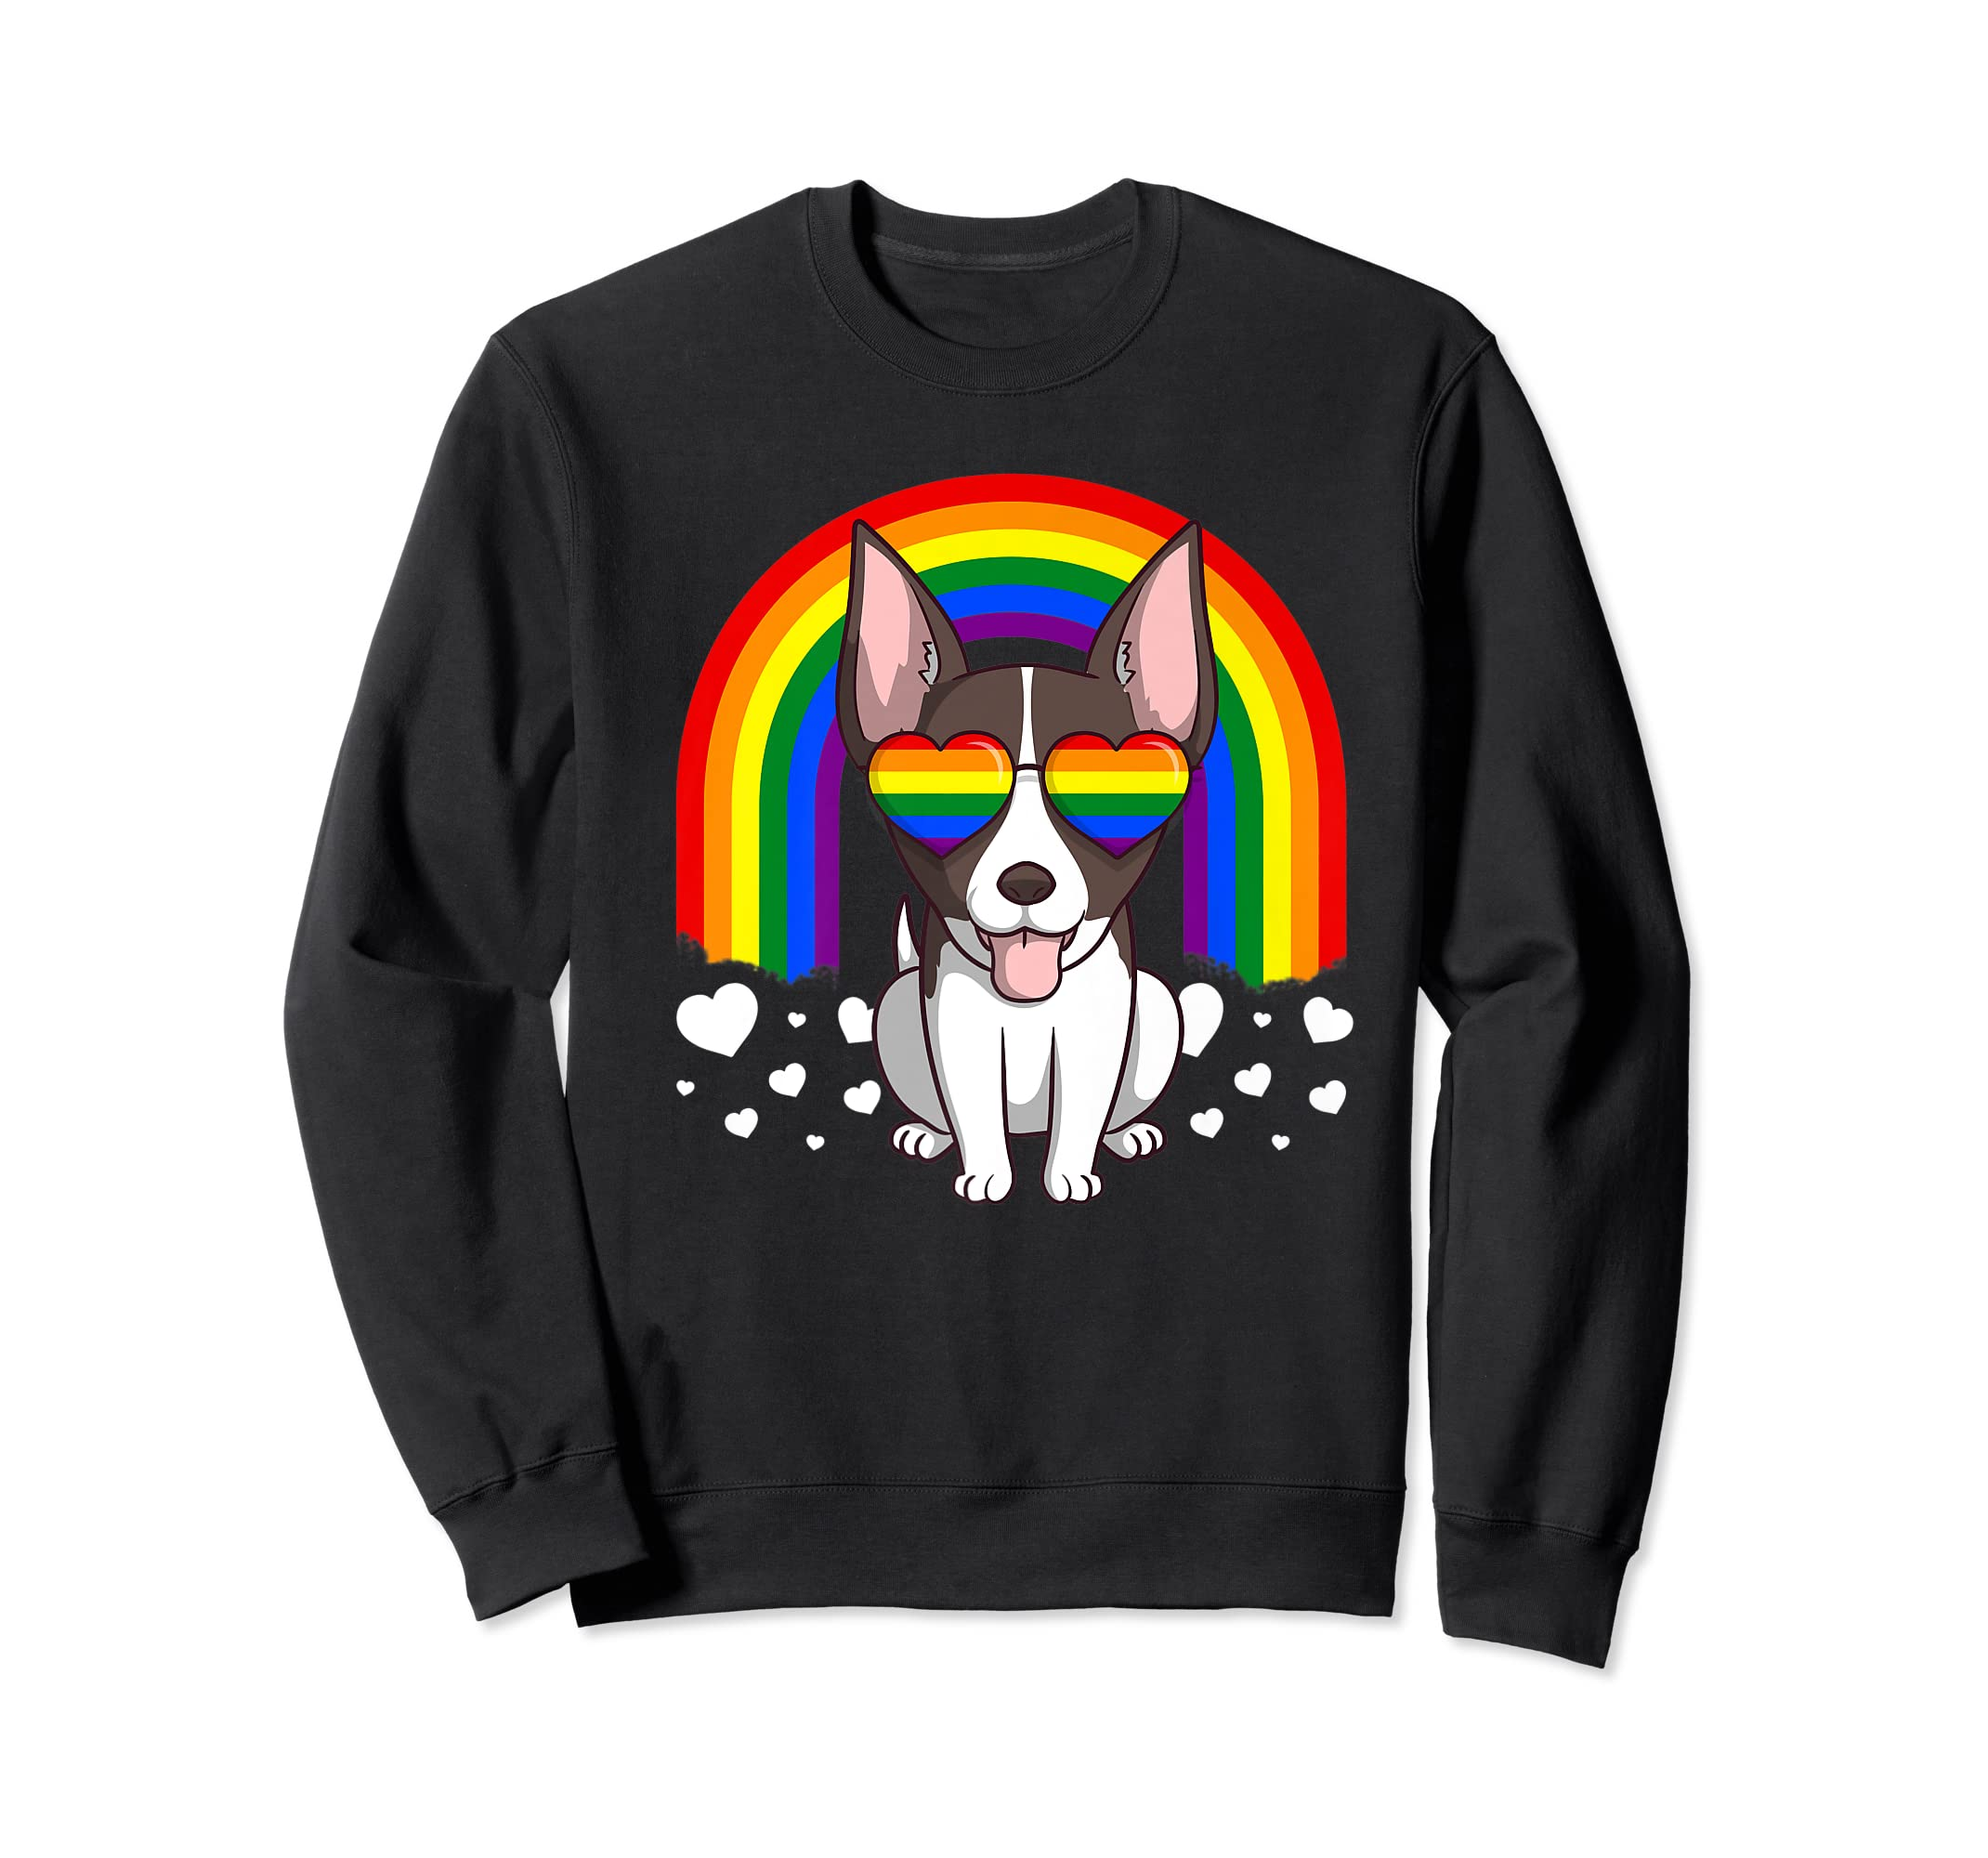 LGBT Rat Terrier Dog Gay Pride Rainbow LGBTQ Cute Gift Premium T-Shirt-Sweatshirt-Black